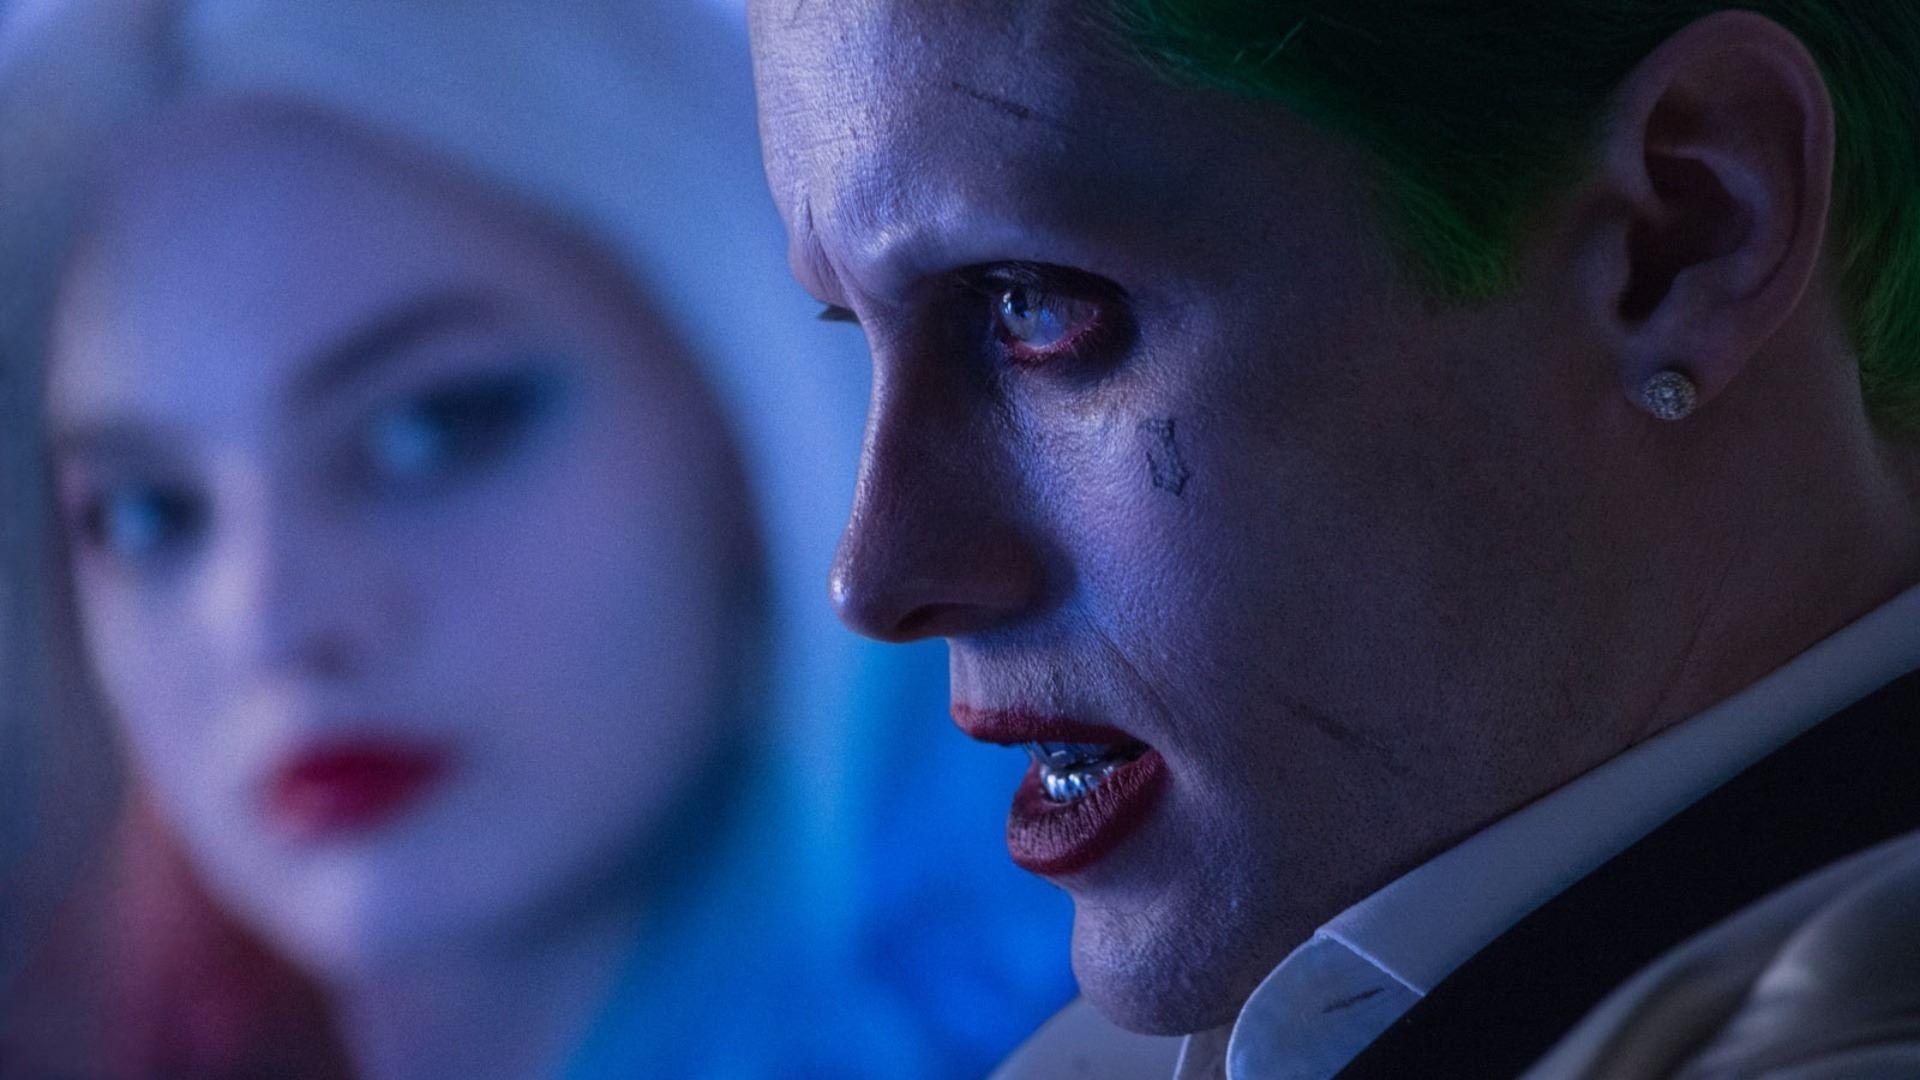 What do you think? #GothamCitySirens or #TheBatman?   #JaredLeto #Joker #Marvel #comics #avengers